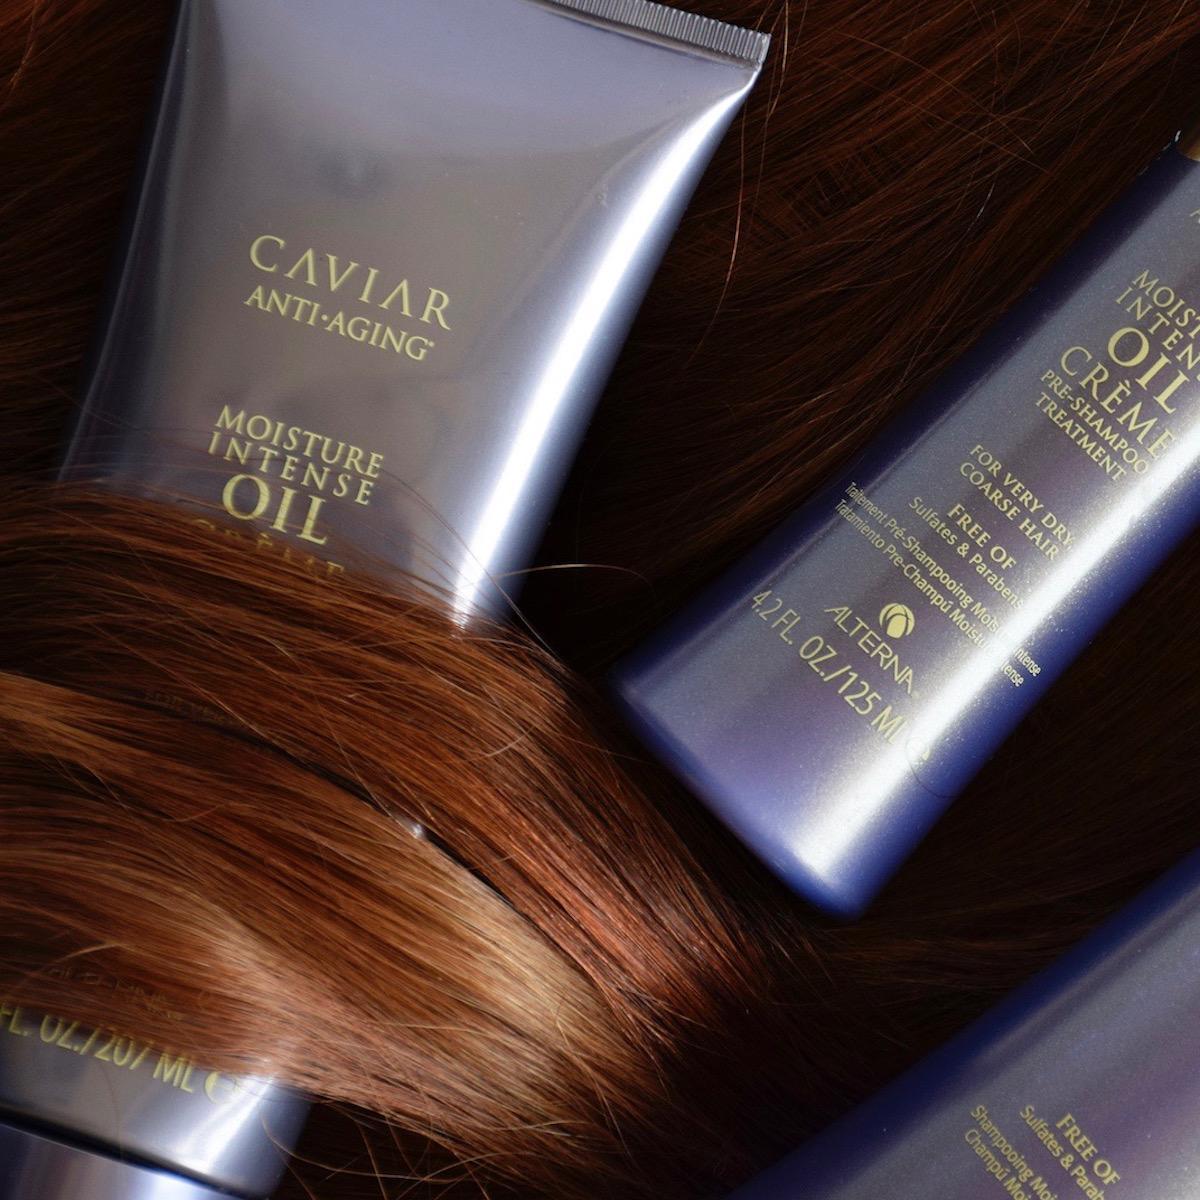 Za suhe lase Alterna Caviar Moisture Intense By Beutyfullblog 10